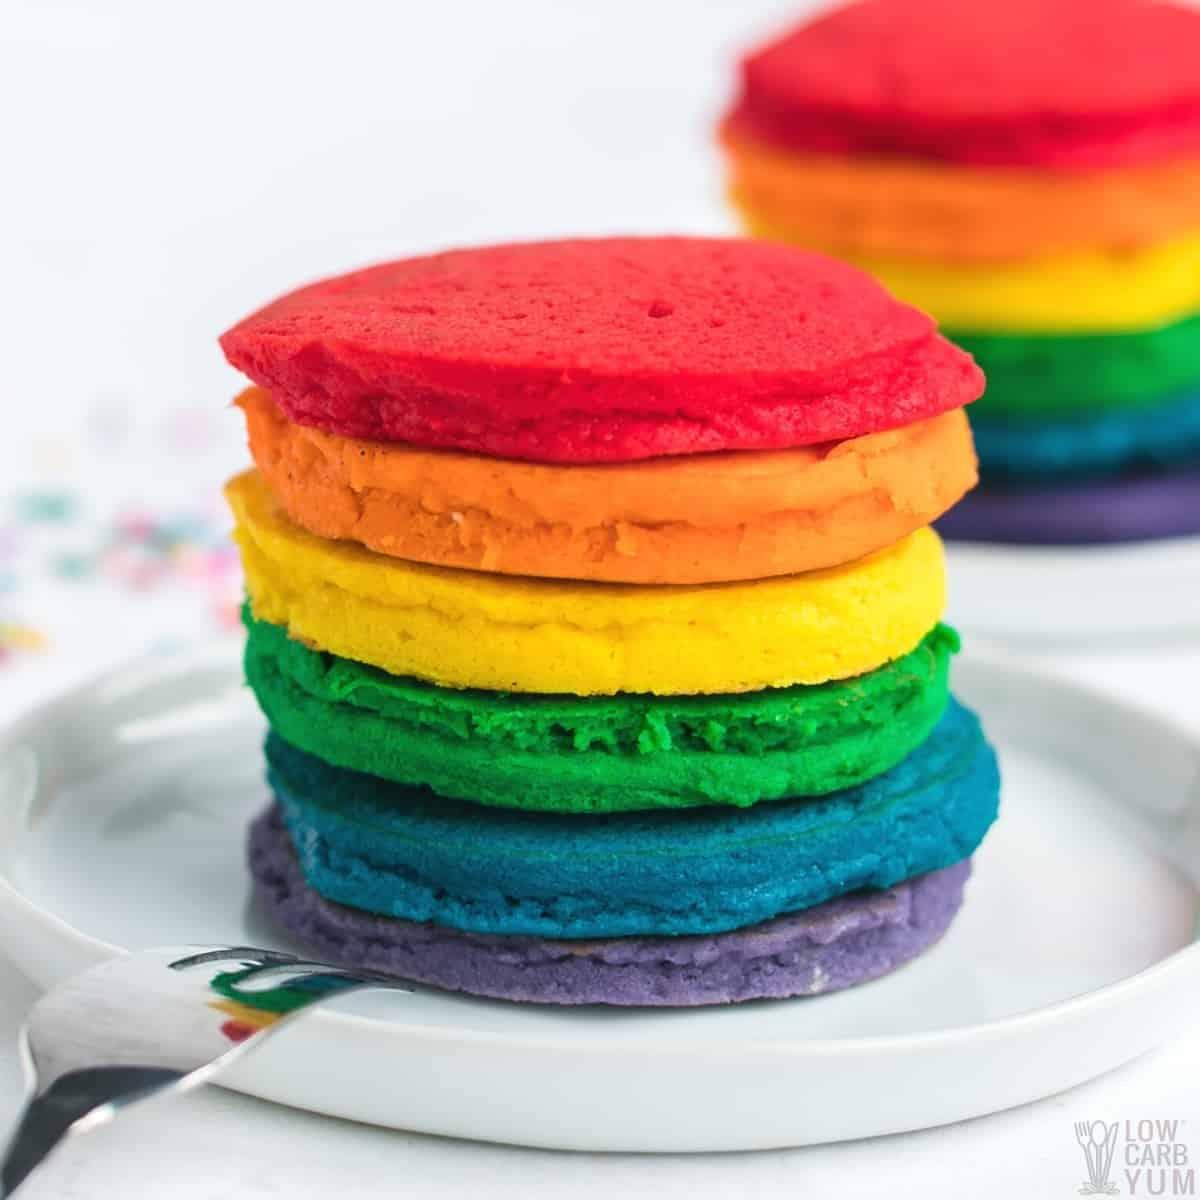 stacks of rainbow pancakes on white plates